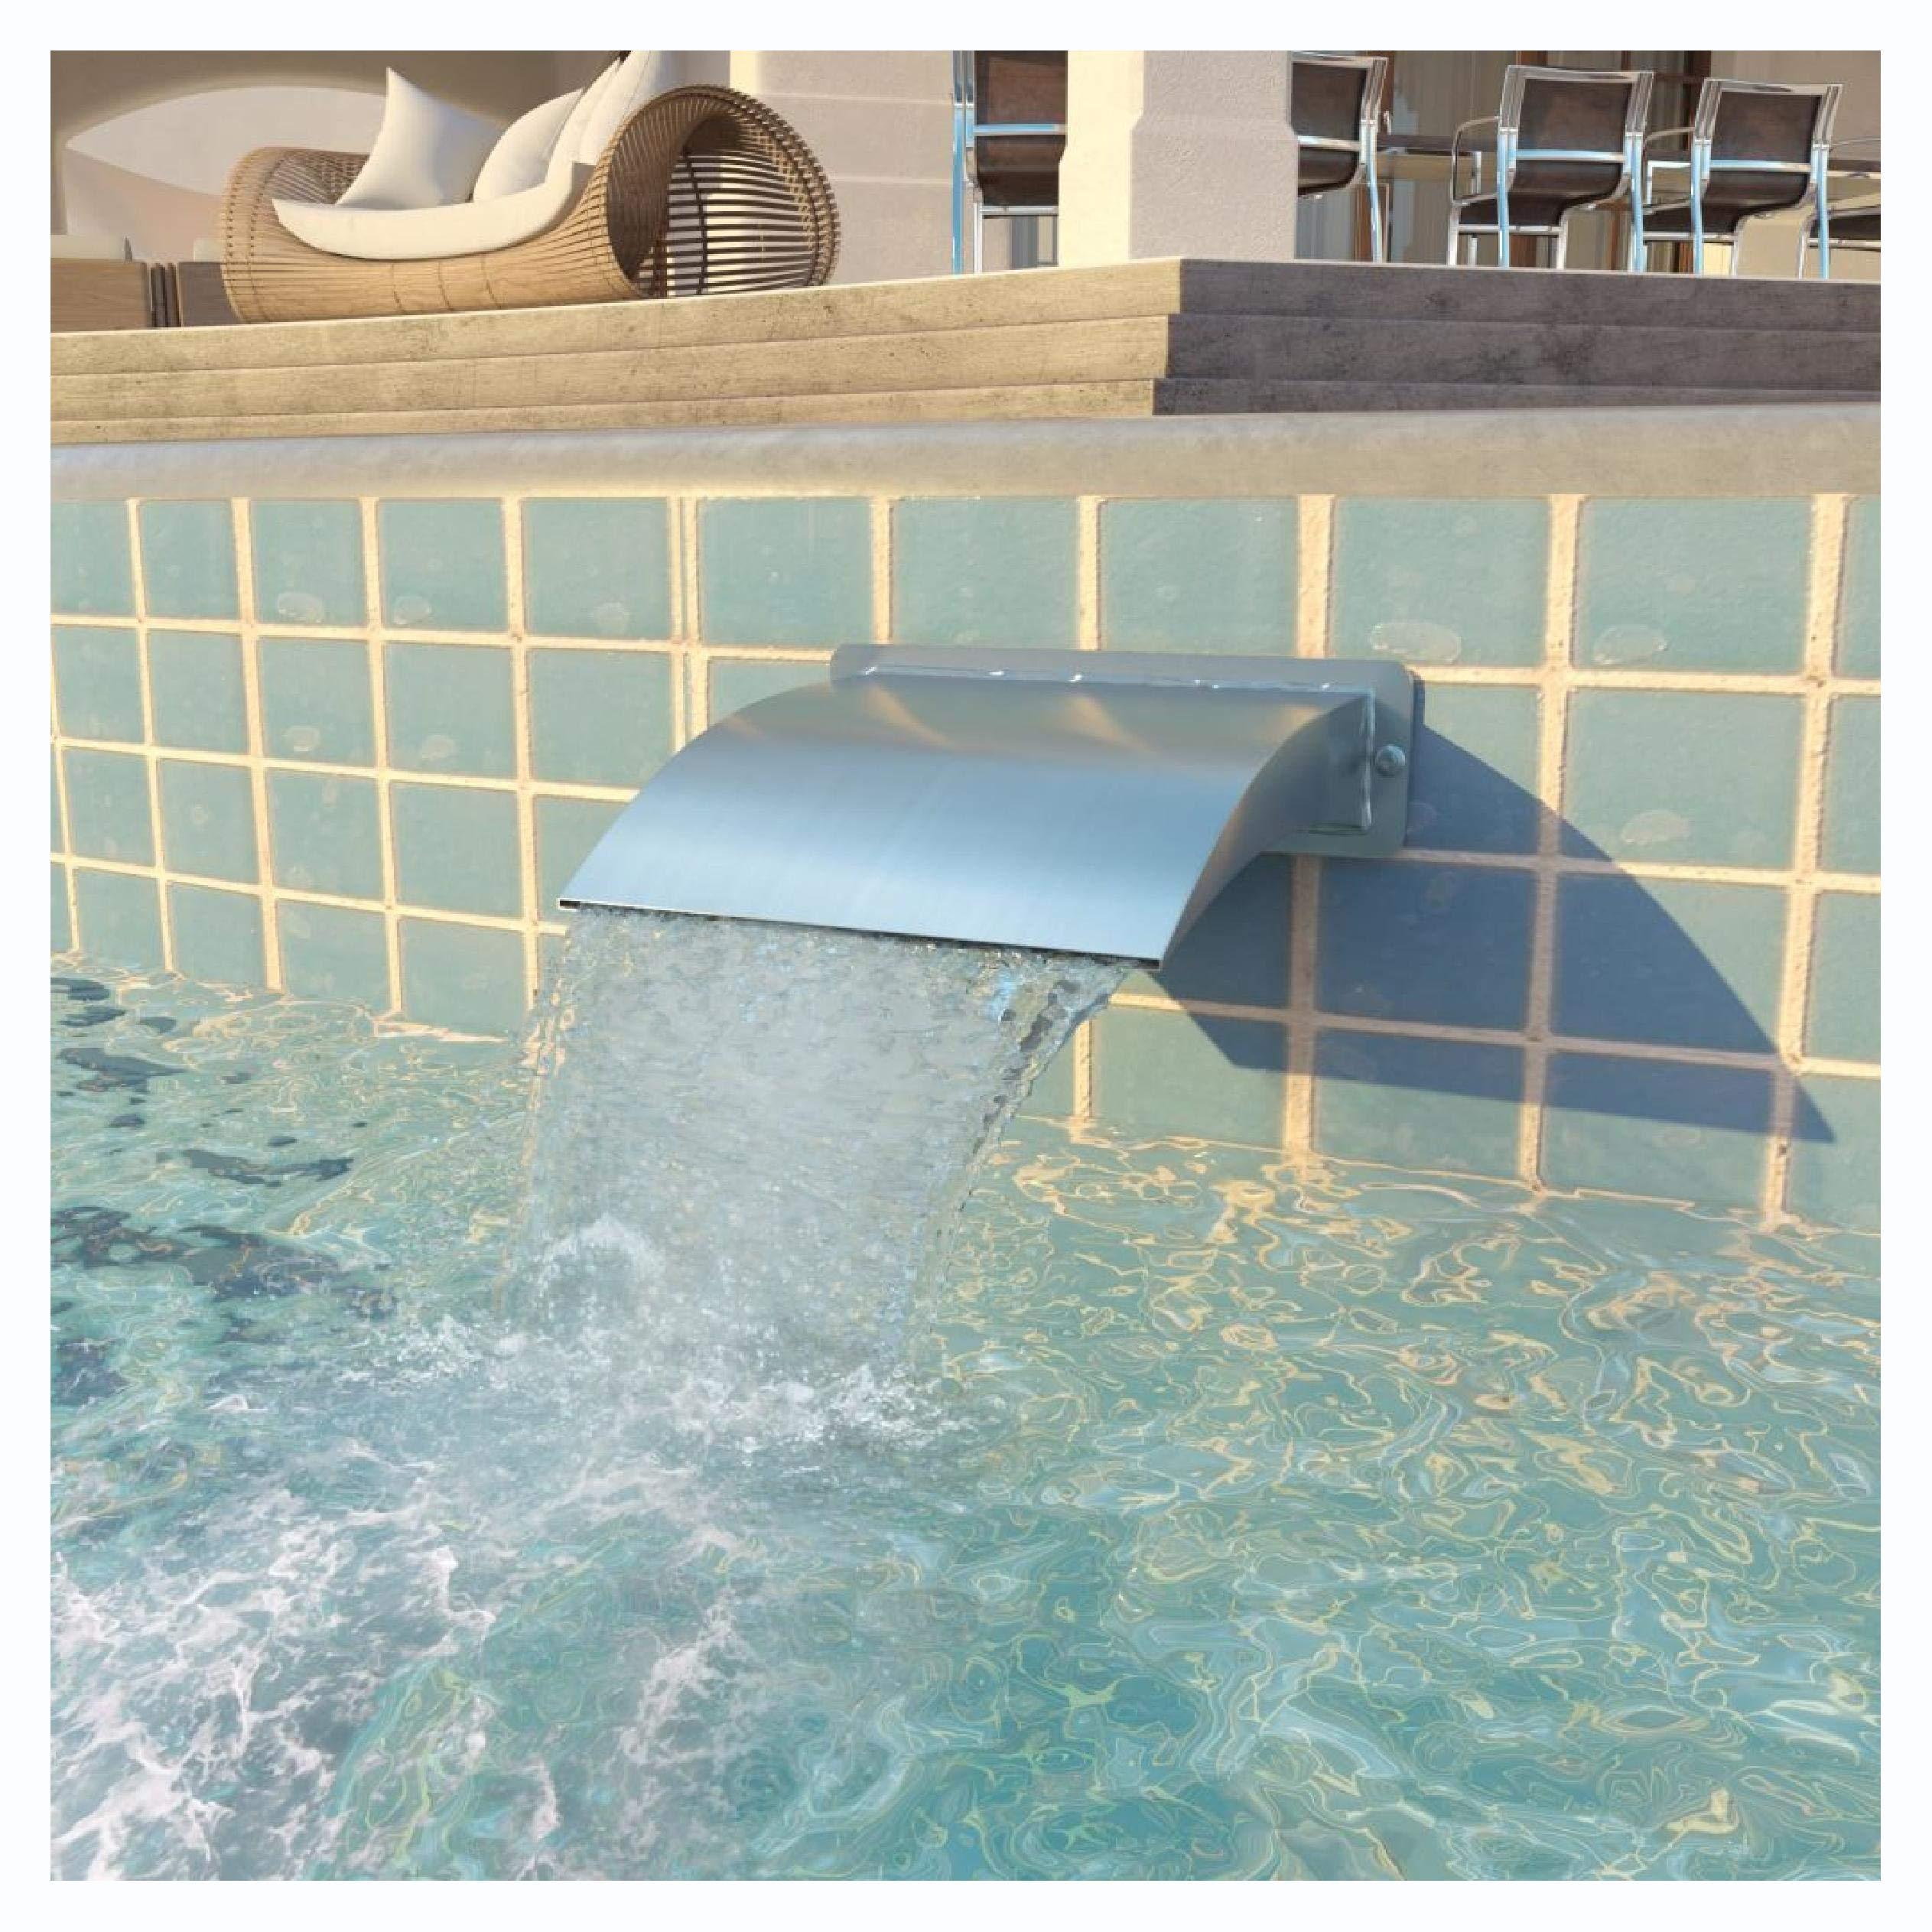 HEATAPPLY Fountain & Waterfall, Pool Fountain Stainless Steel 11.8''x3.5''x10.2'' Silver